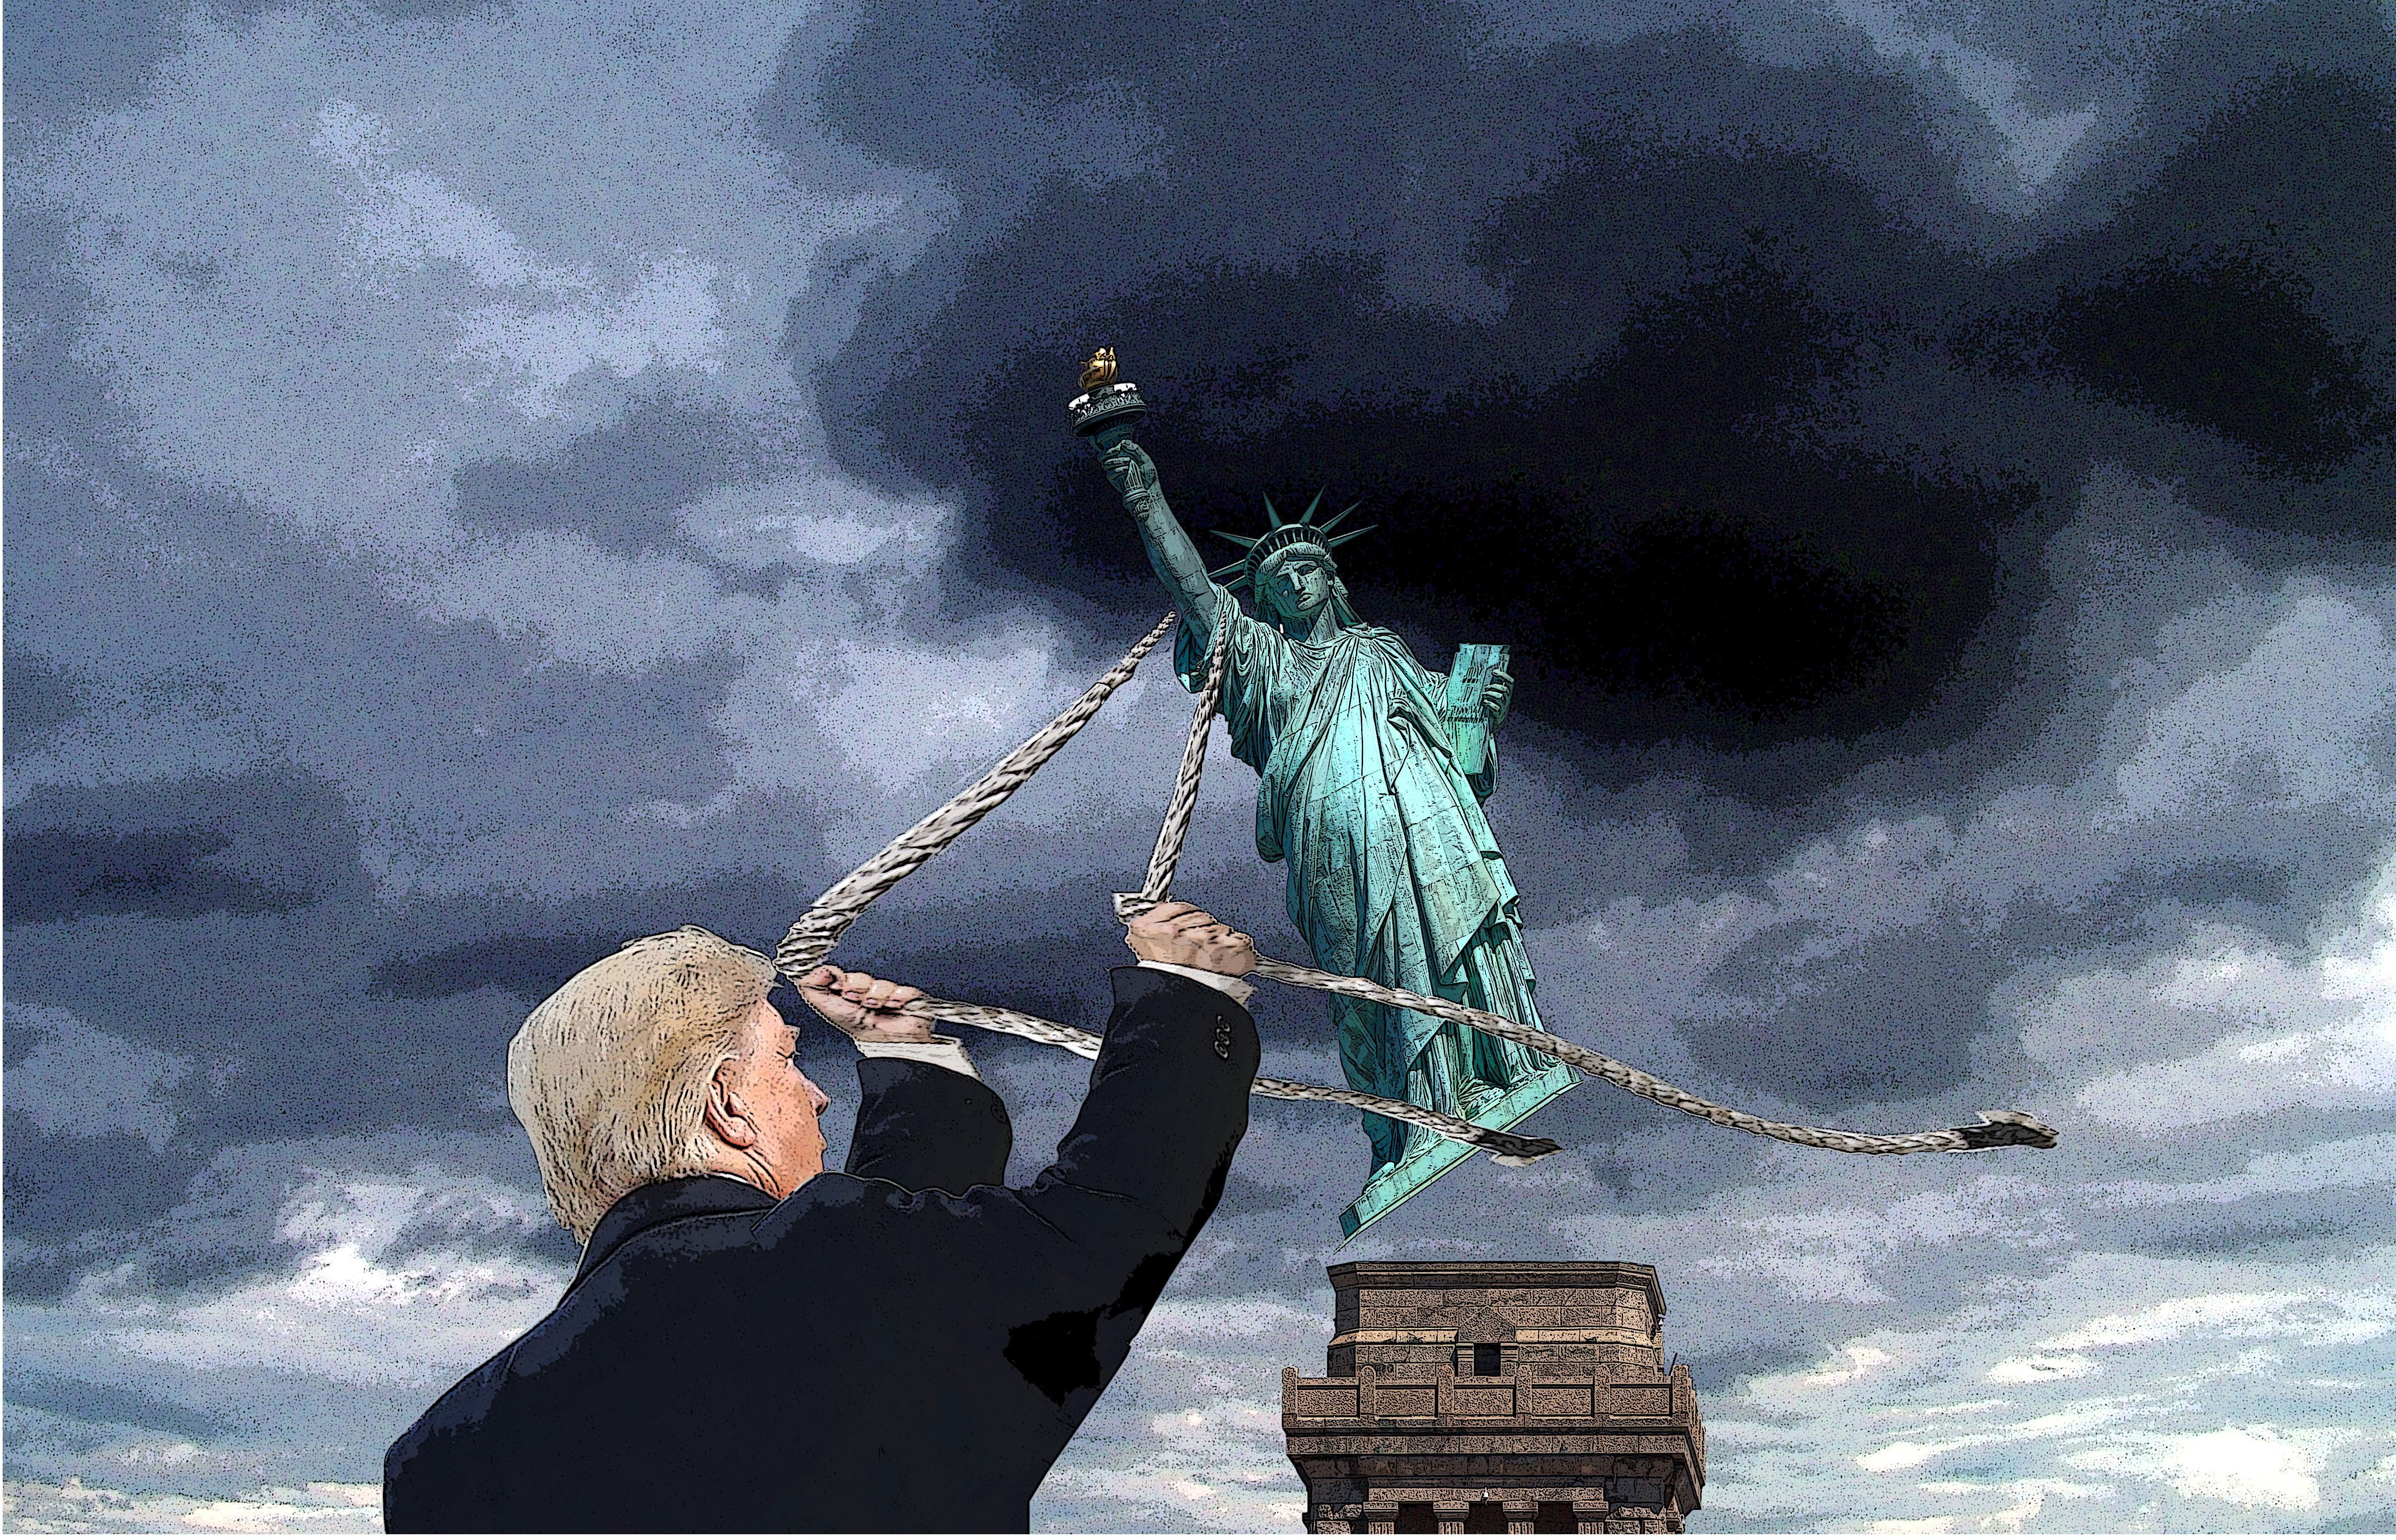 bostonglobe.com - Ali Noorani - Impeaching America's immigration values